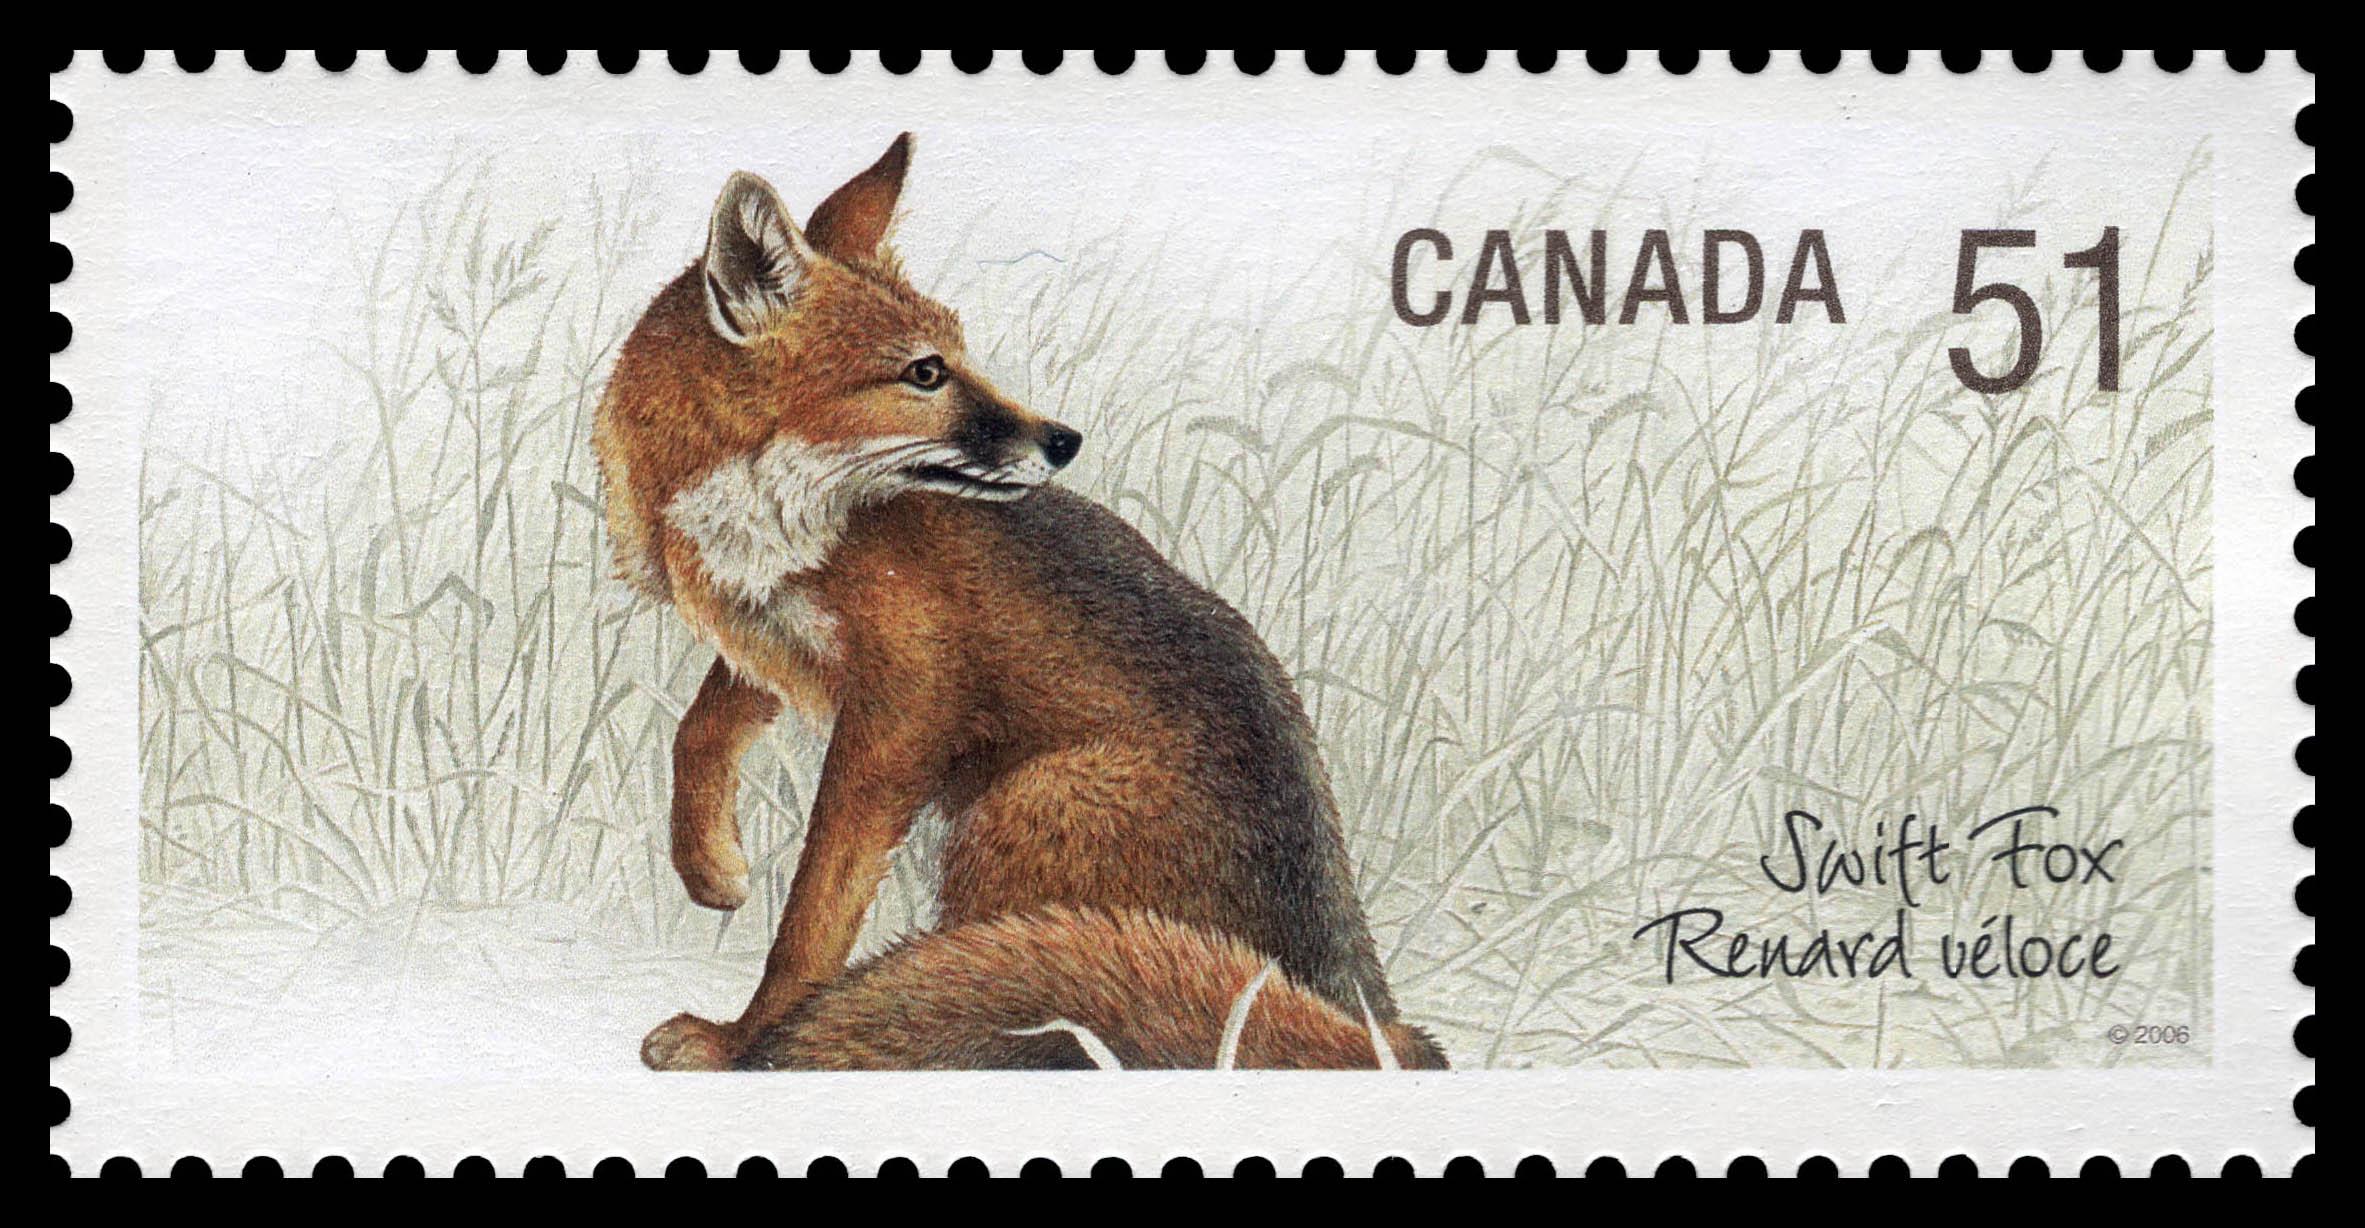 Swift fox Canada Postage Stamp